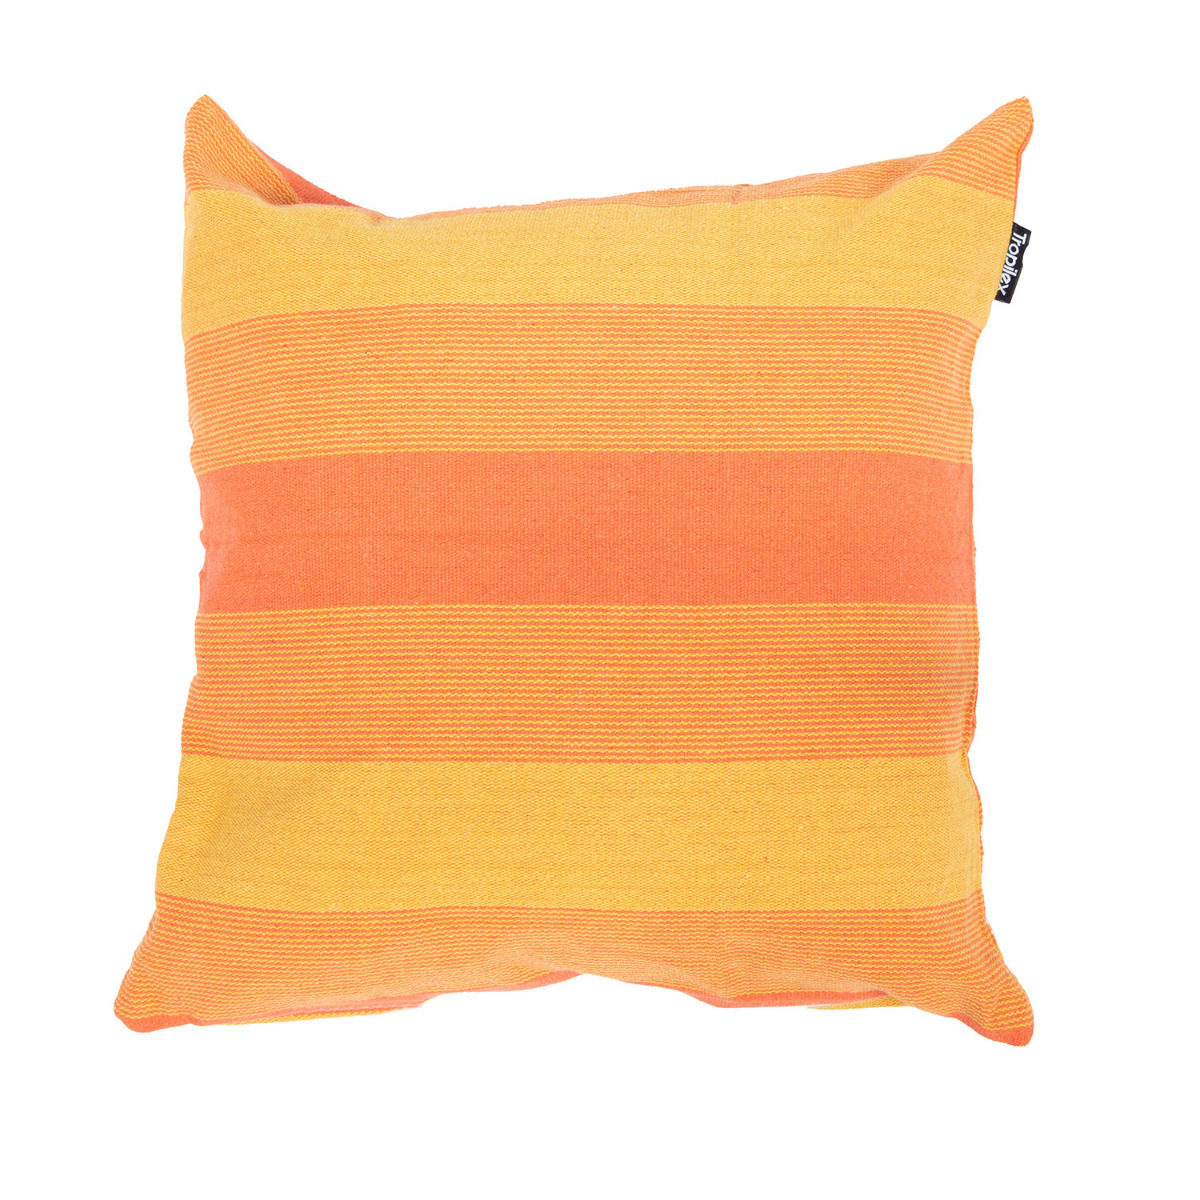 Kussen 'Dream' Orange - Oranje - Tropilex �